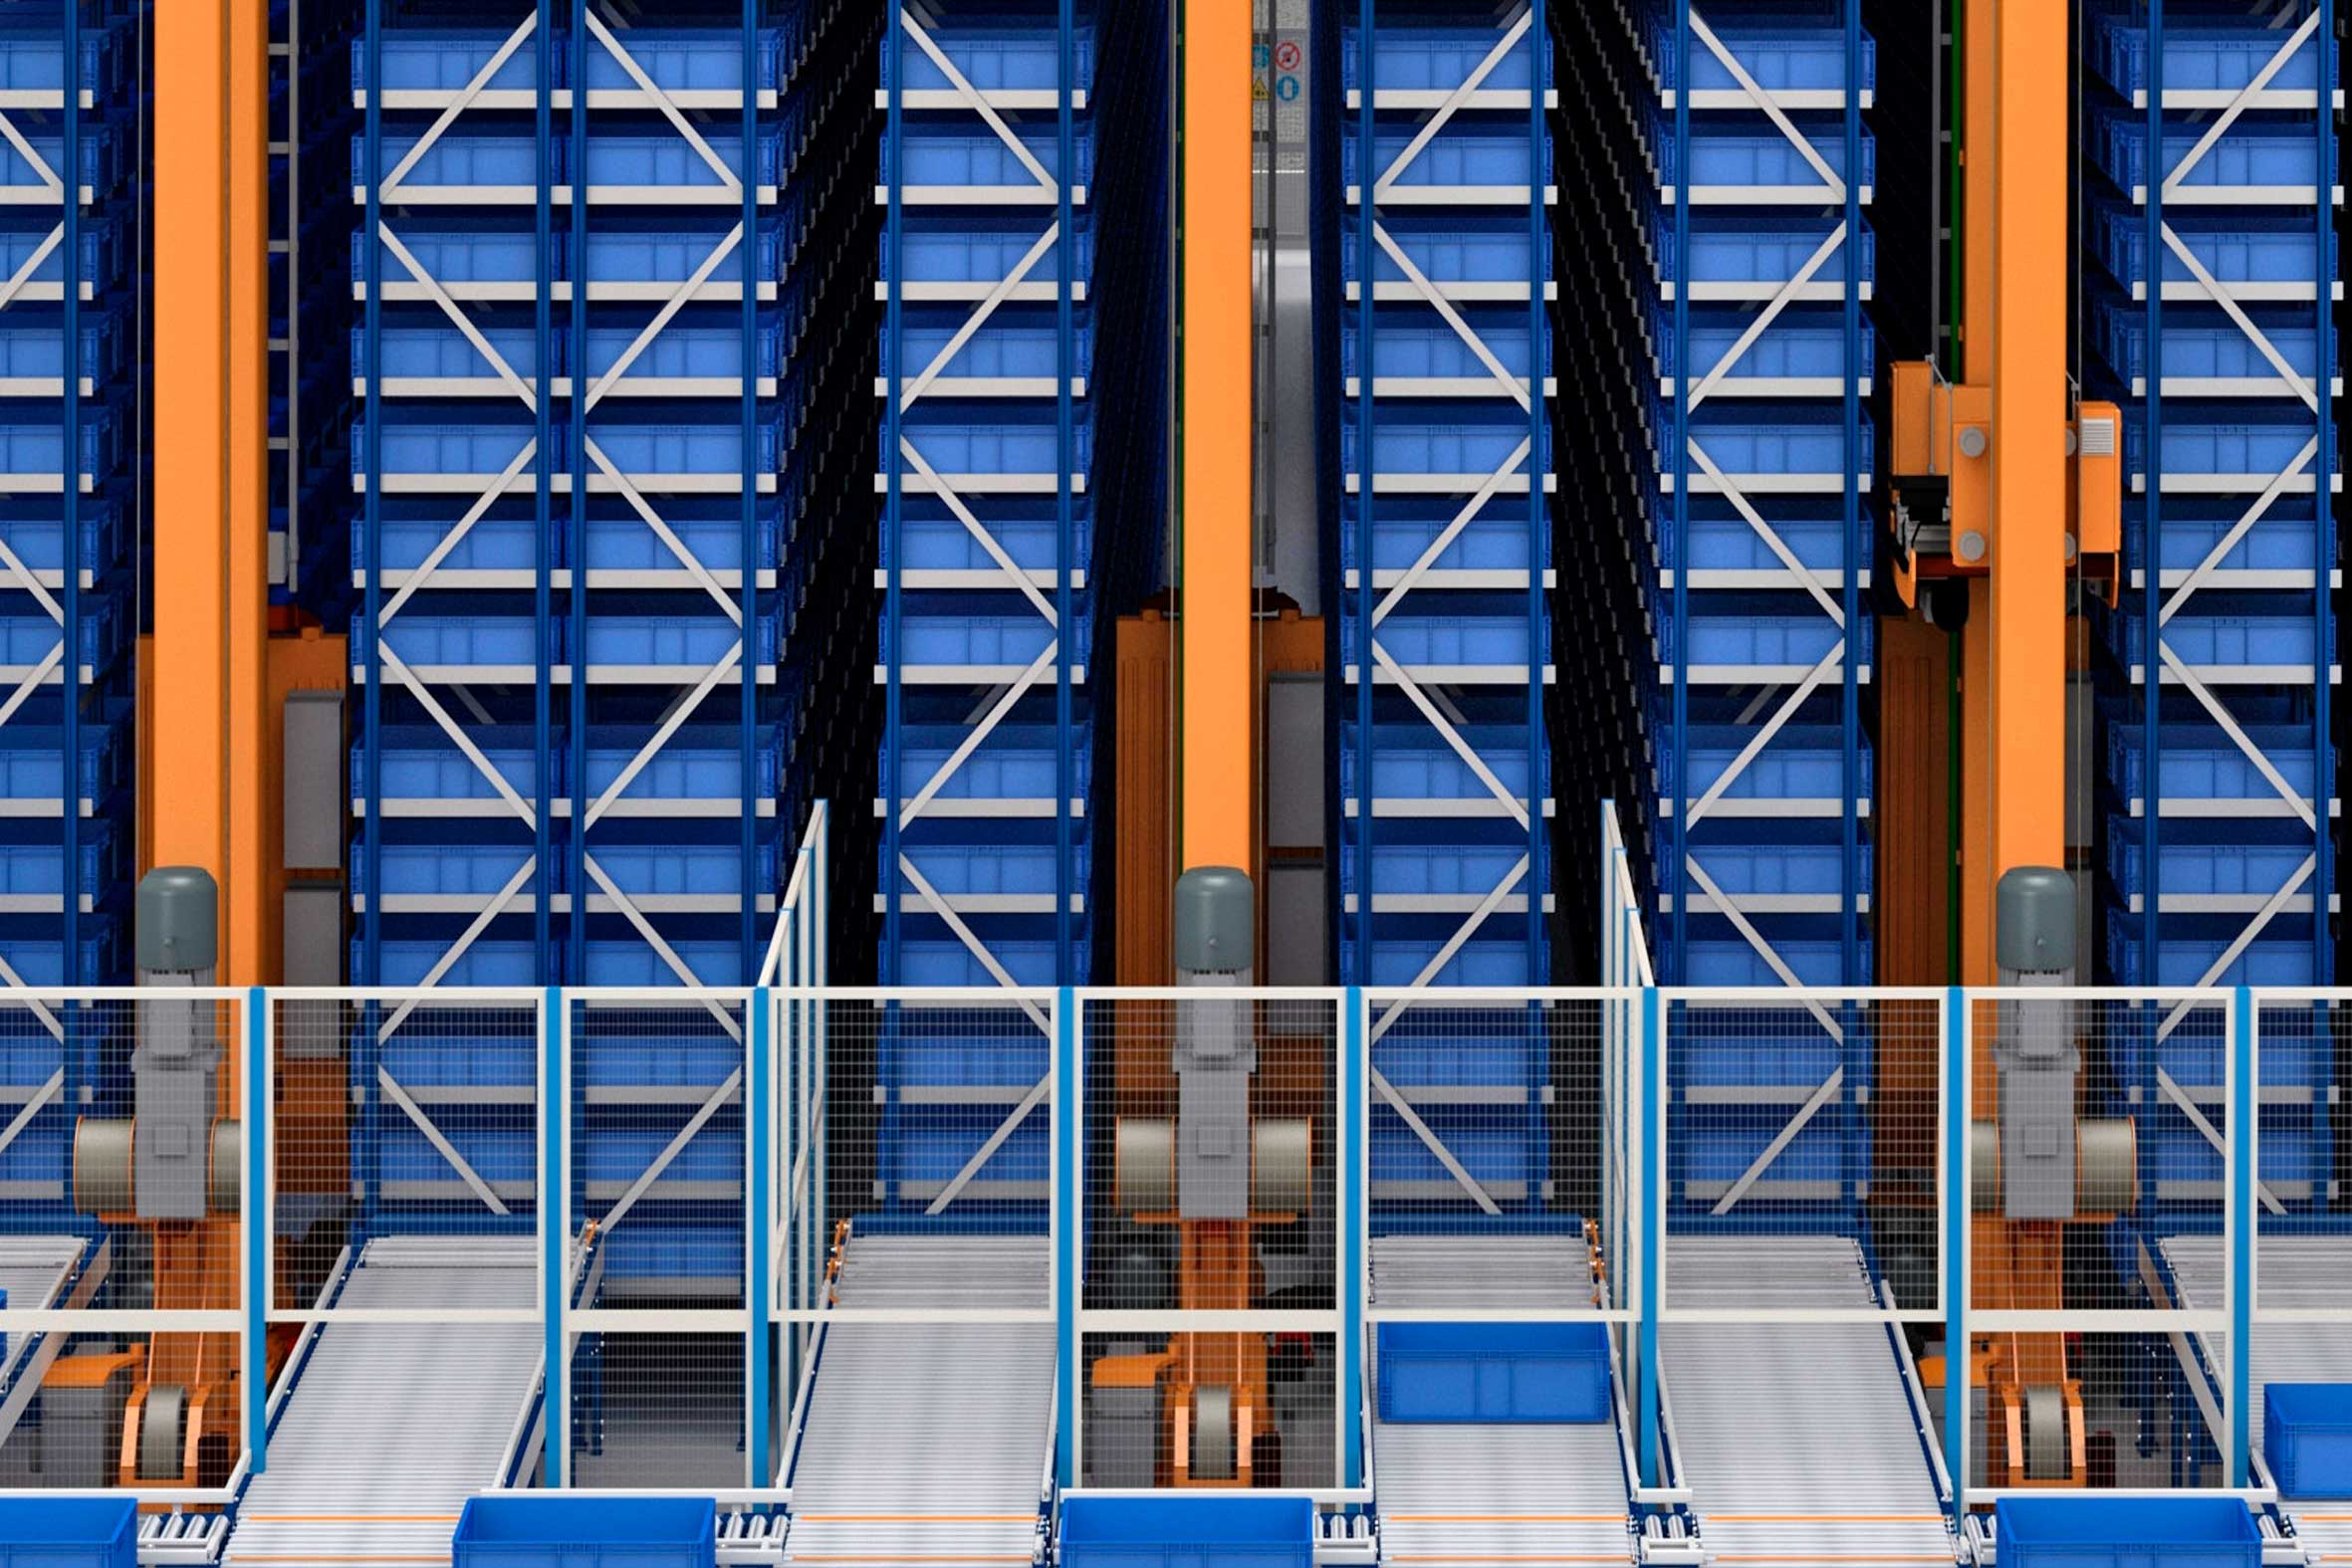 O armazém automático de caixas da empresa tecnológica NormaGrup